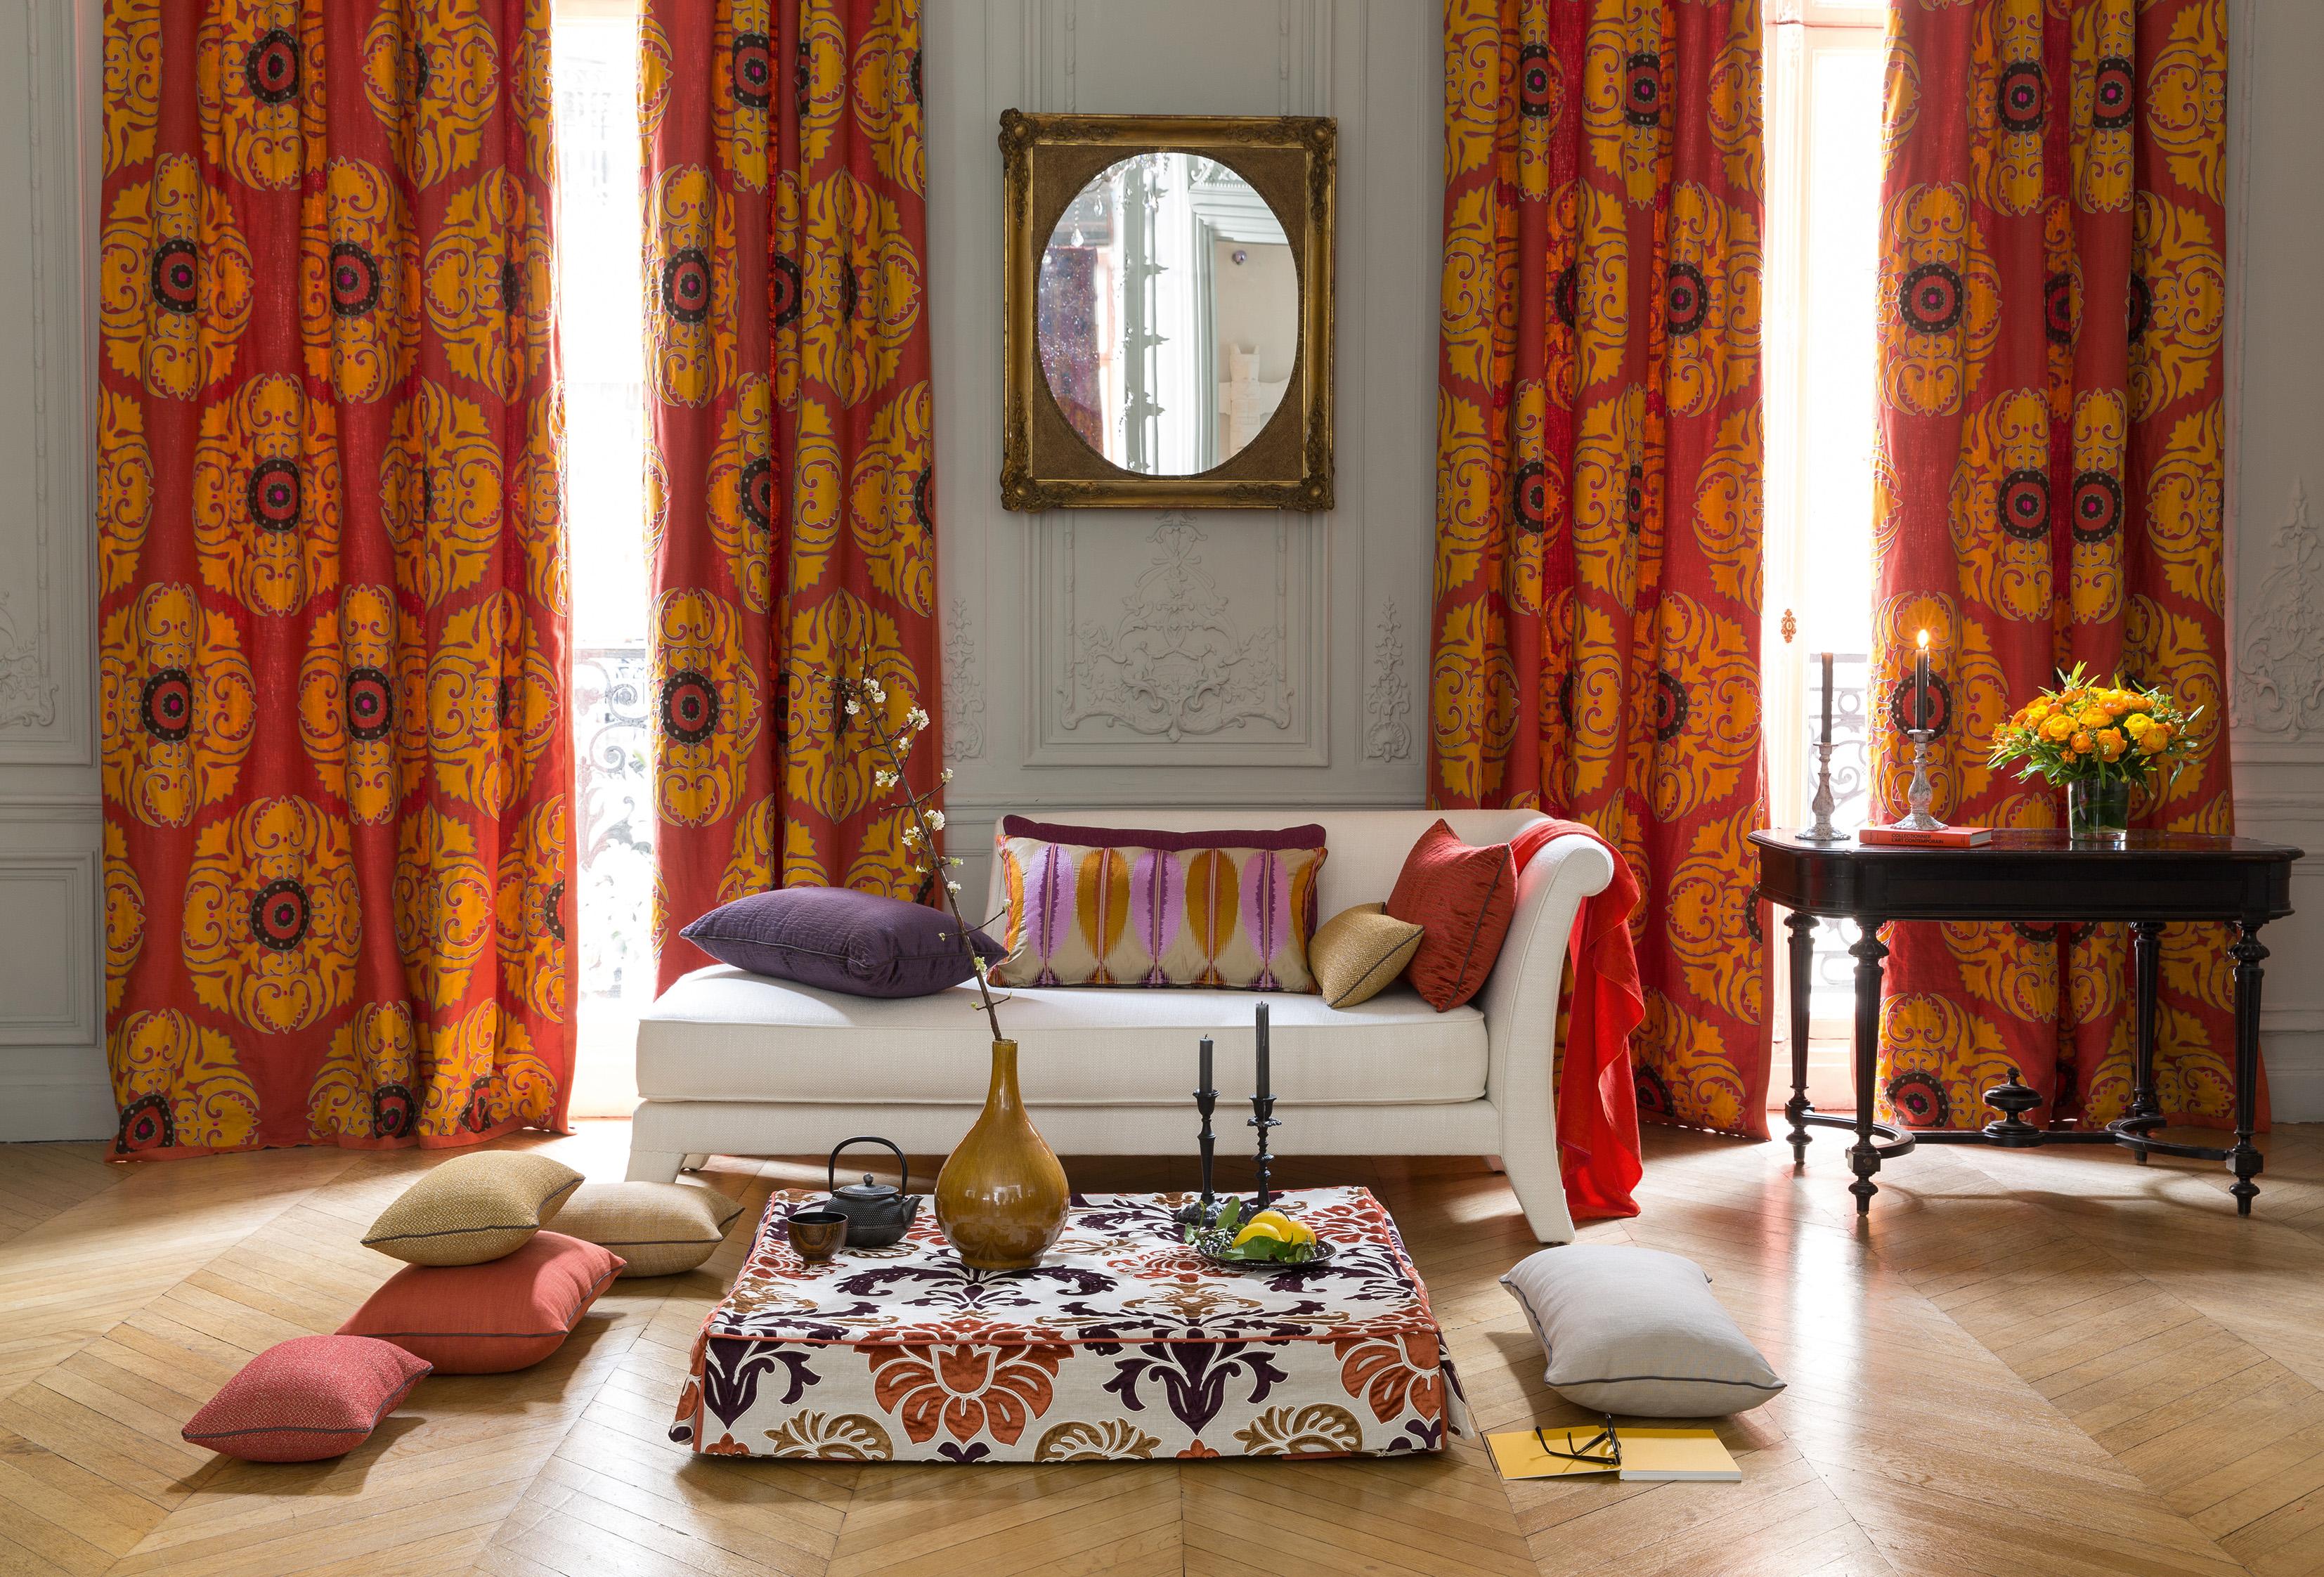 kingcome sofa sale decorative accent pillows home manuel canovas